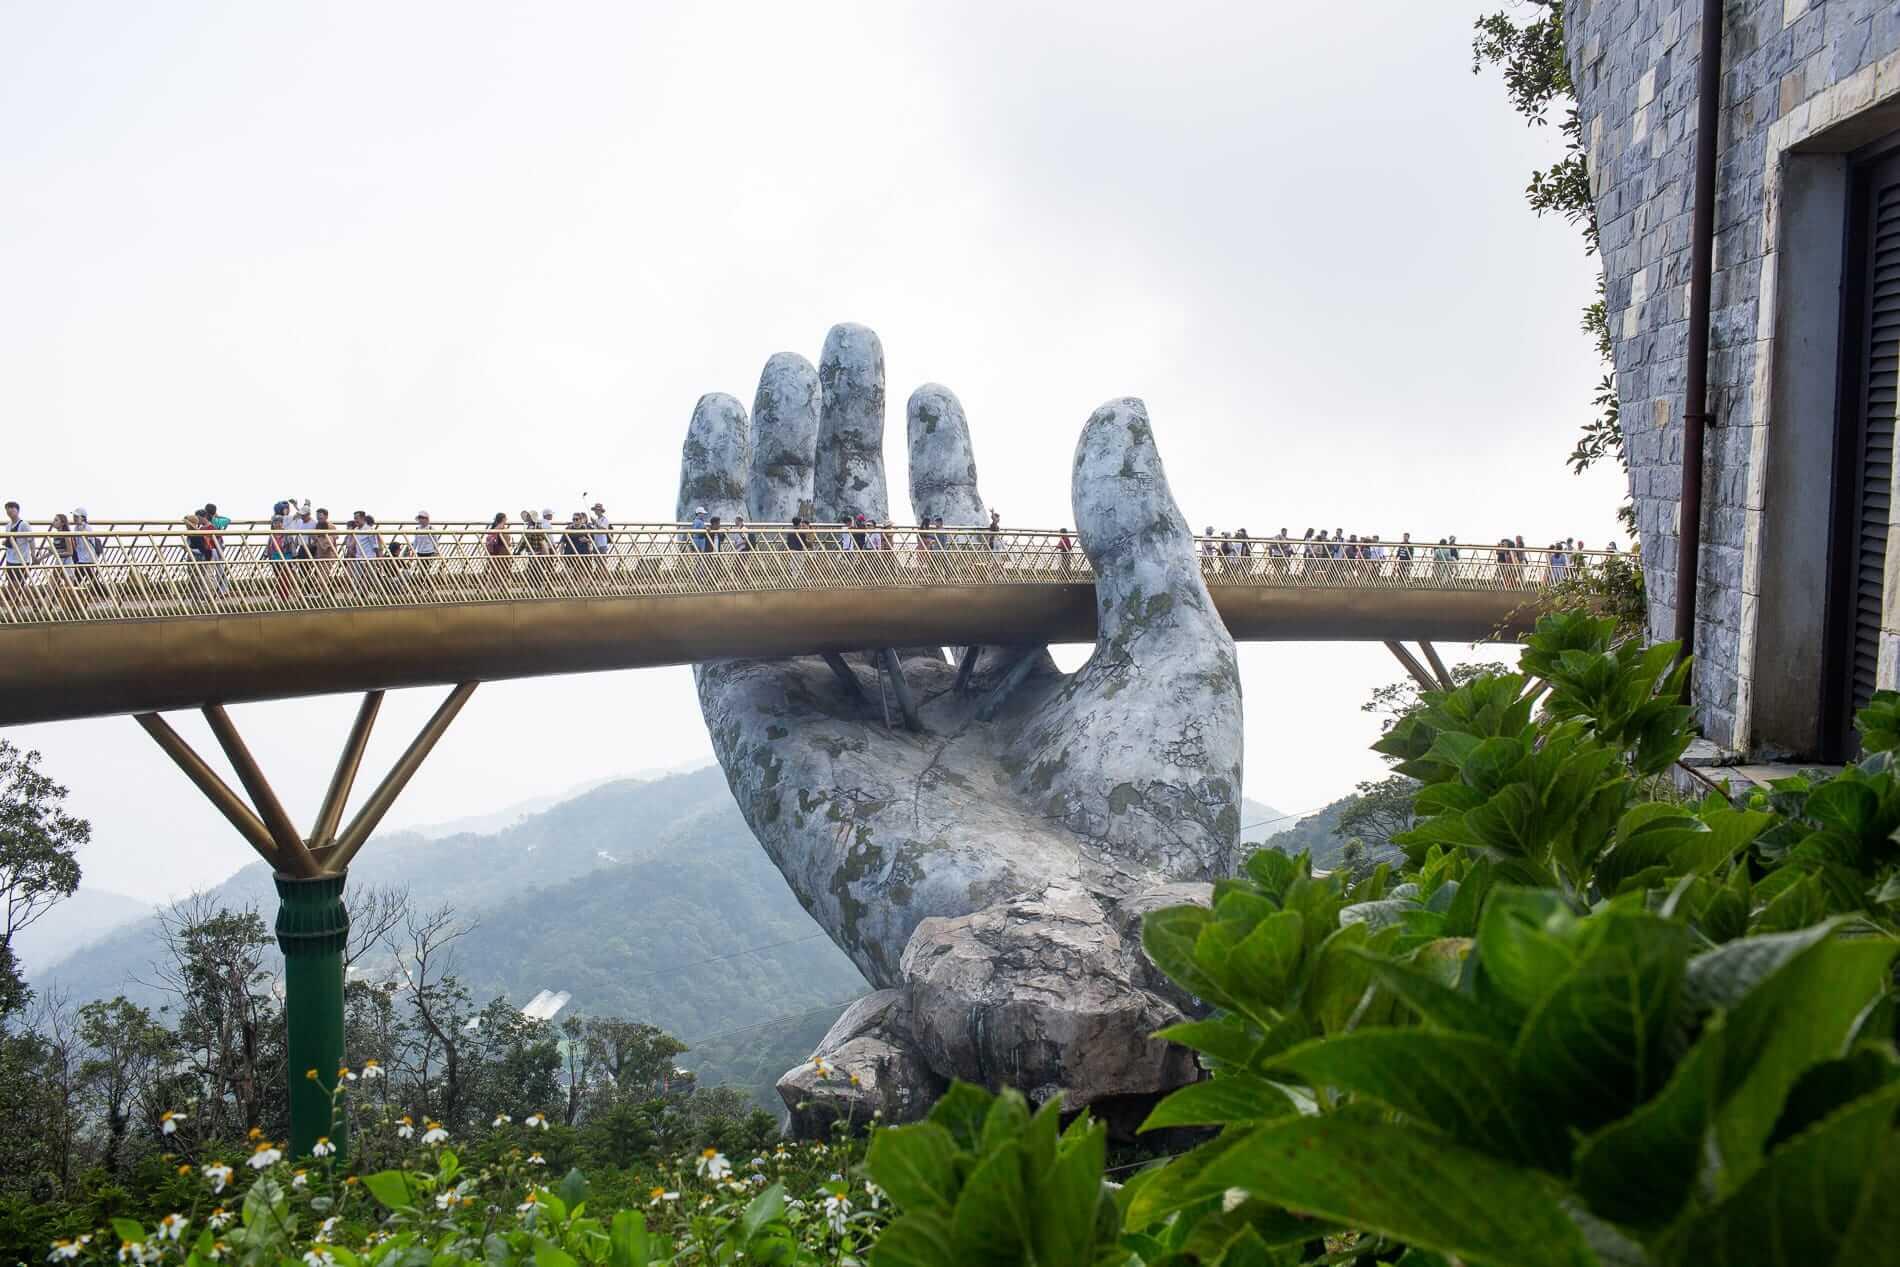 Visitors on the golden bridge